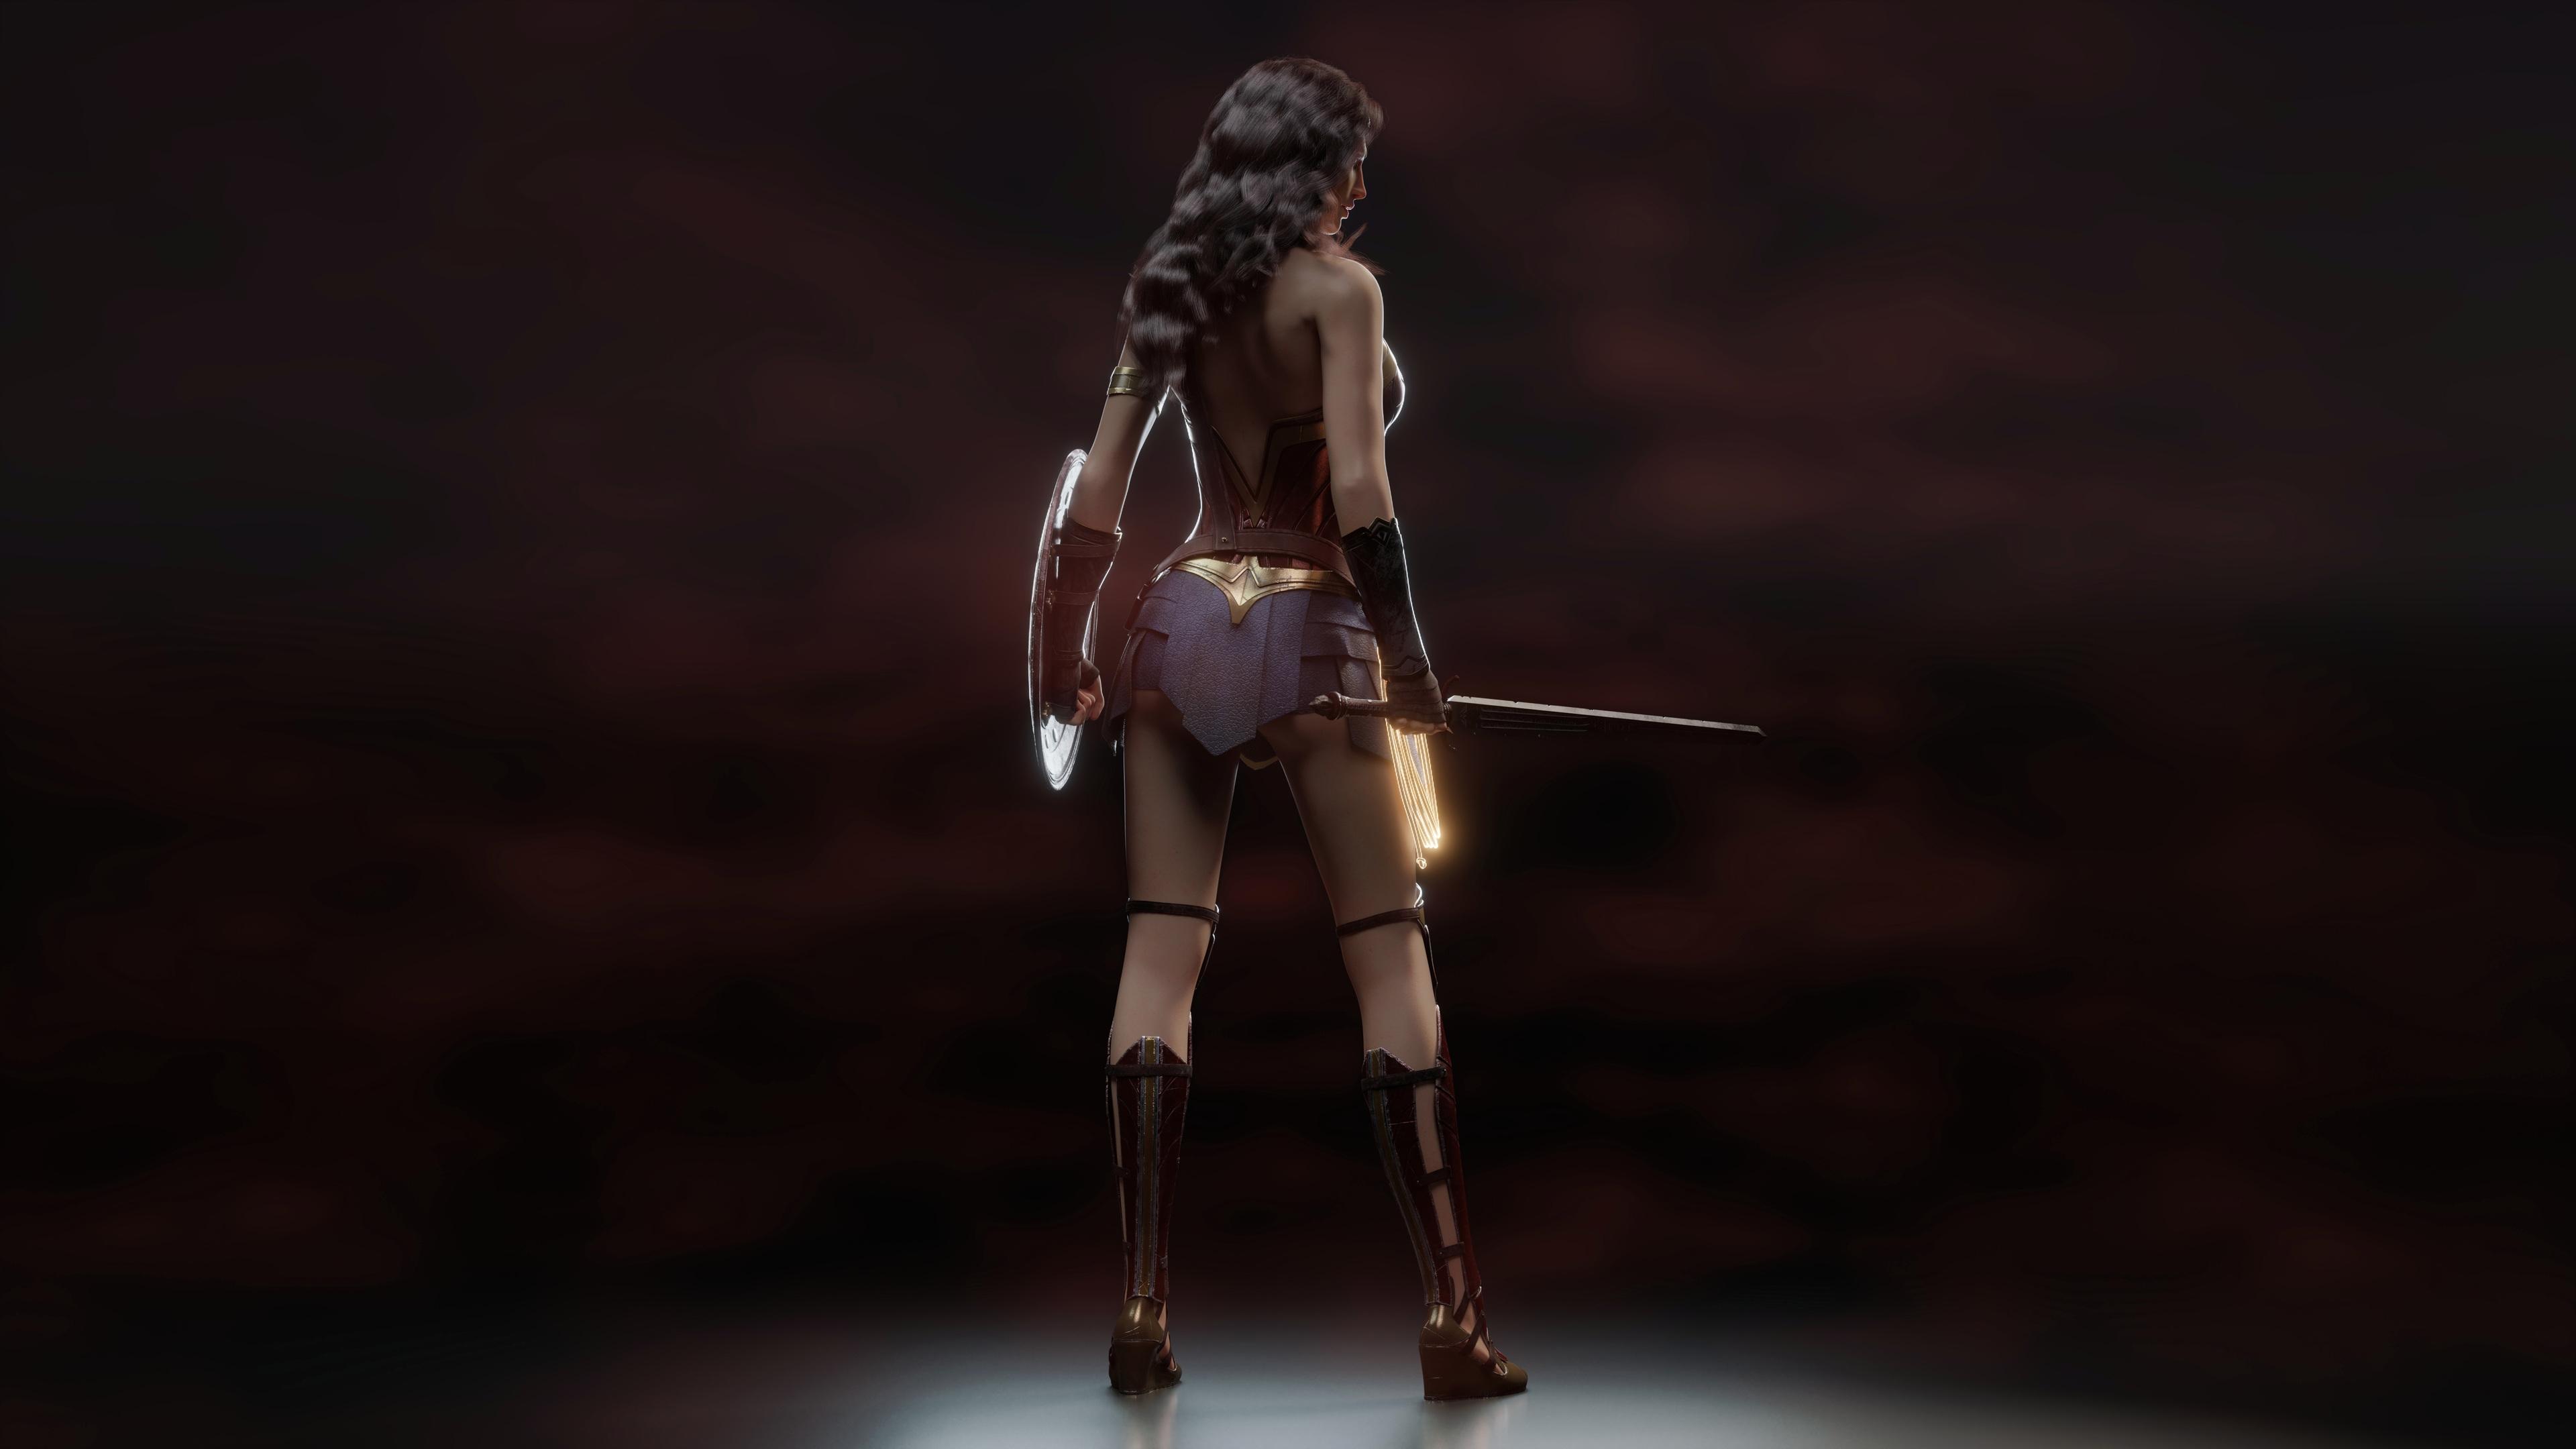 wonder woman 5k digital art 1536522708 - Wonder Woman 5k Digital Art - wonder woman wallpapers, superheroes wallpapers, hd-wallpapers, digital art wallpapers, artwork wallpapers, artist wallpapers, 5k wallpapers, 4k-wallpapers